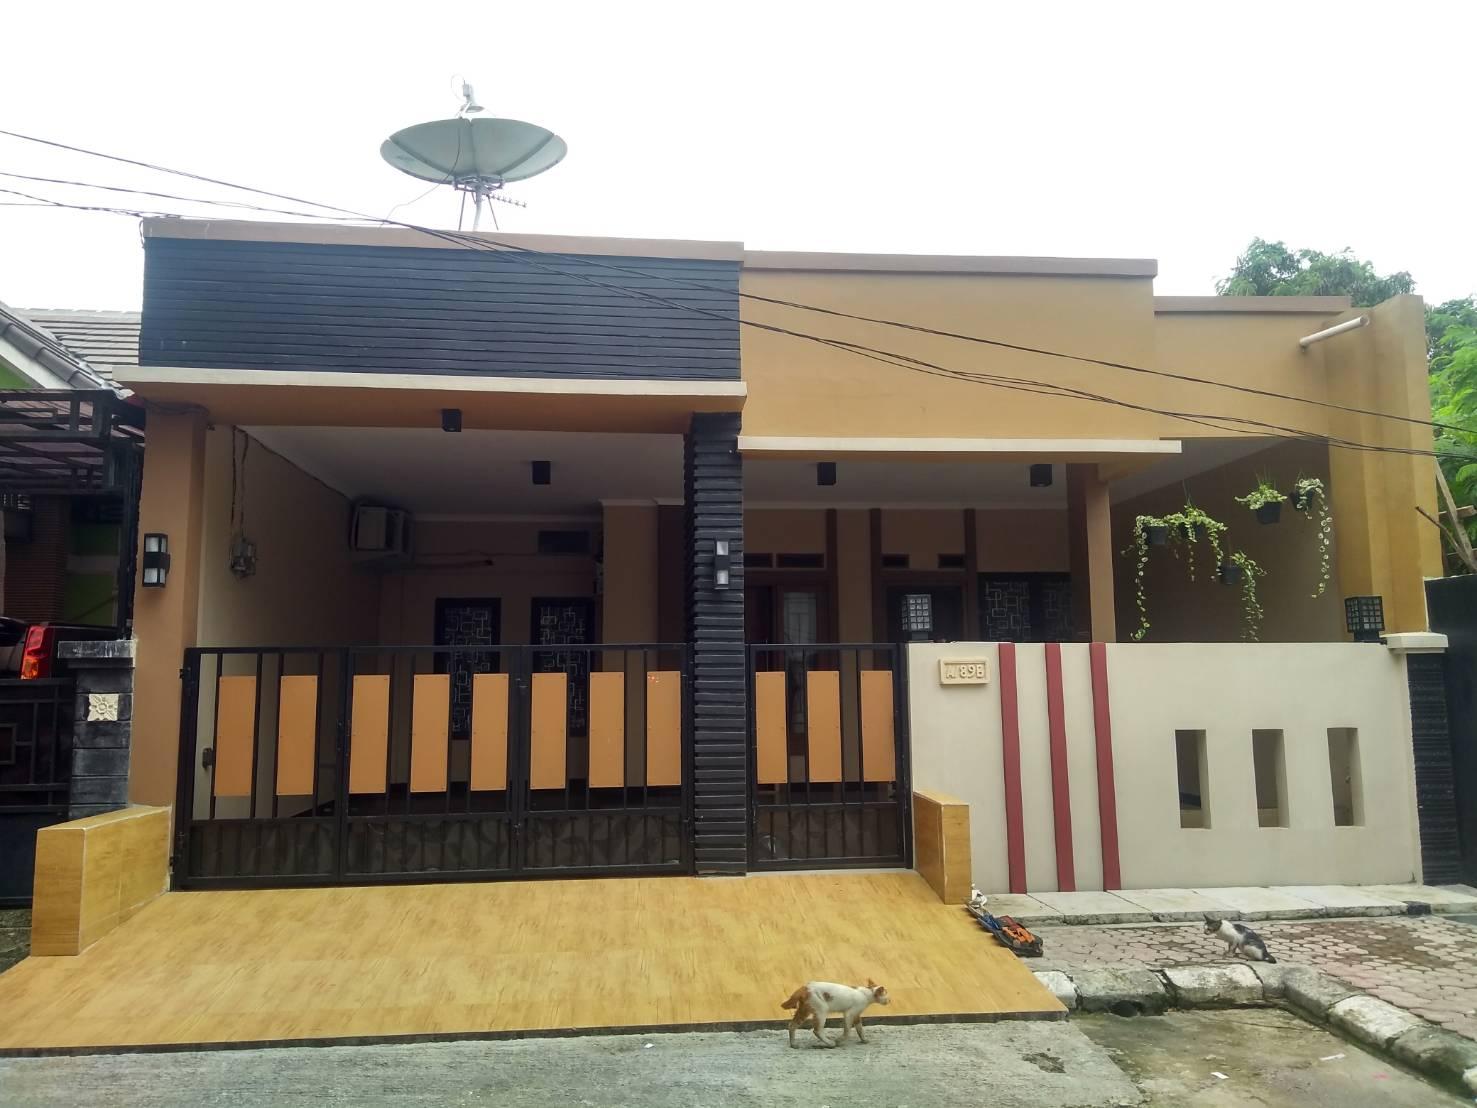 Dijual Cepat Rumah Rapi Siap Huni di Vila Mutiara Gading 2, Bekasi